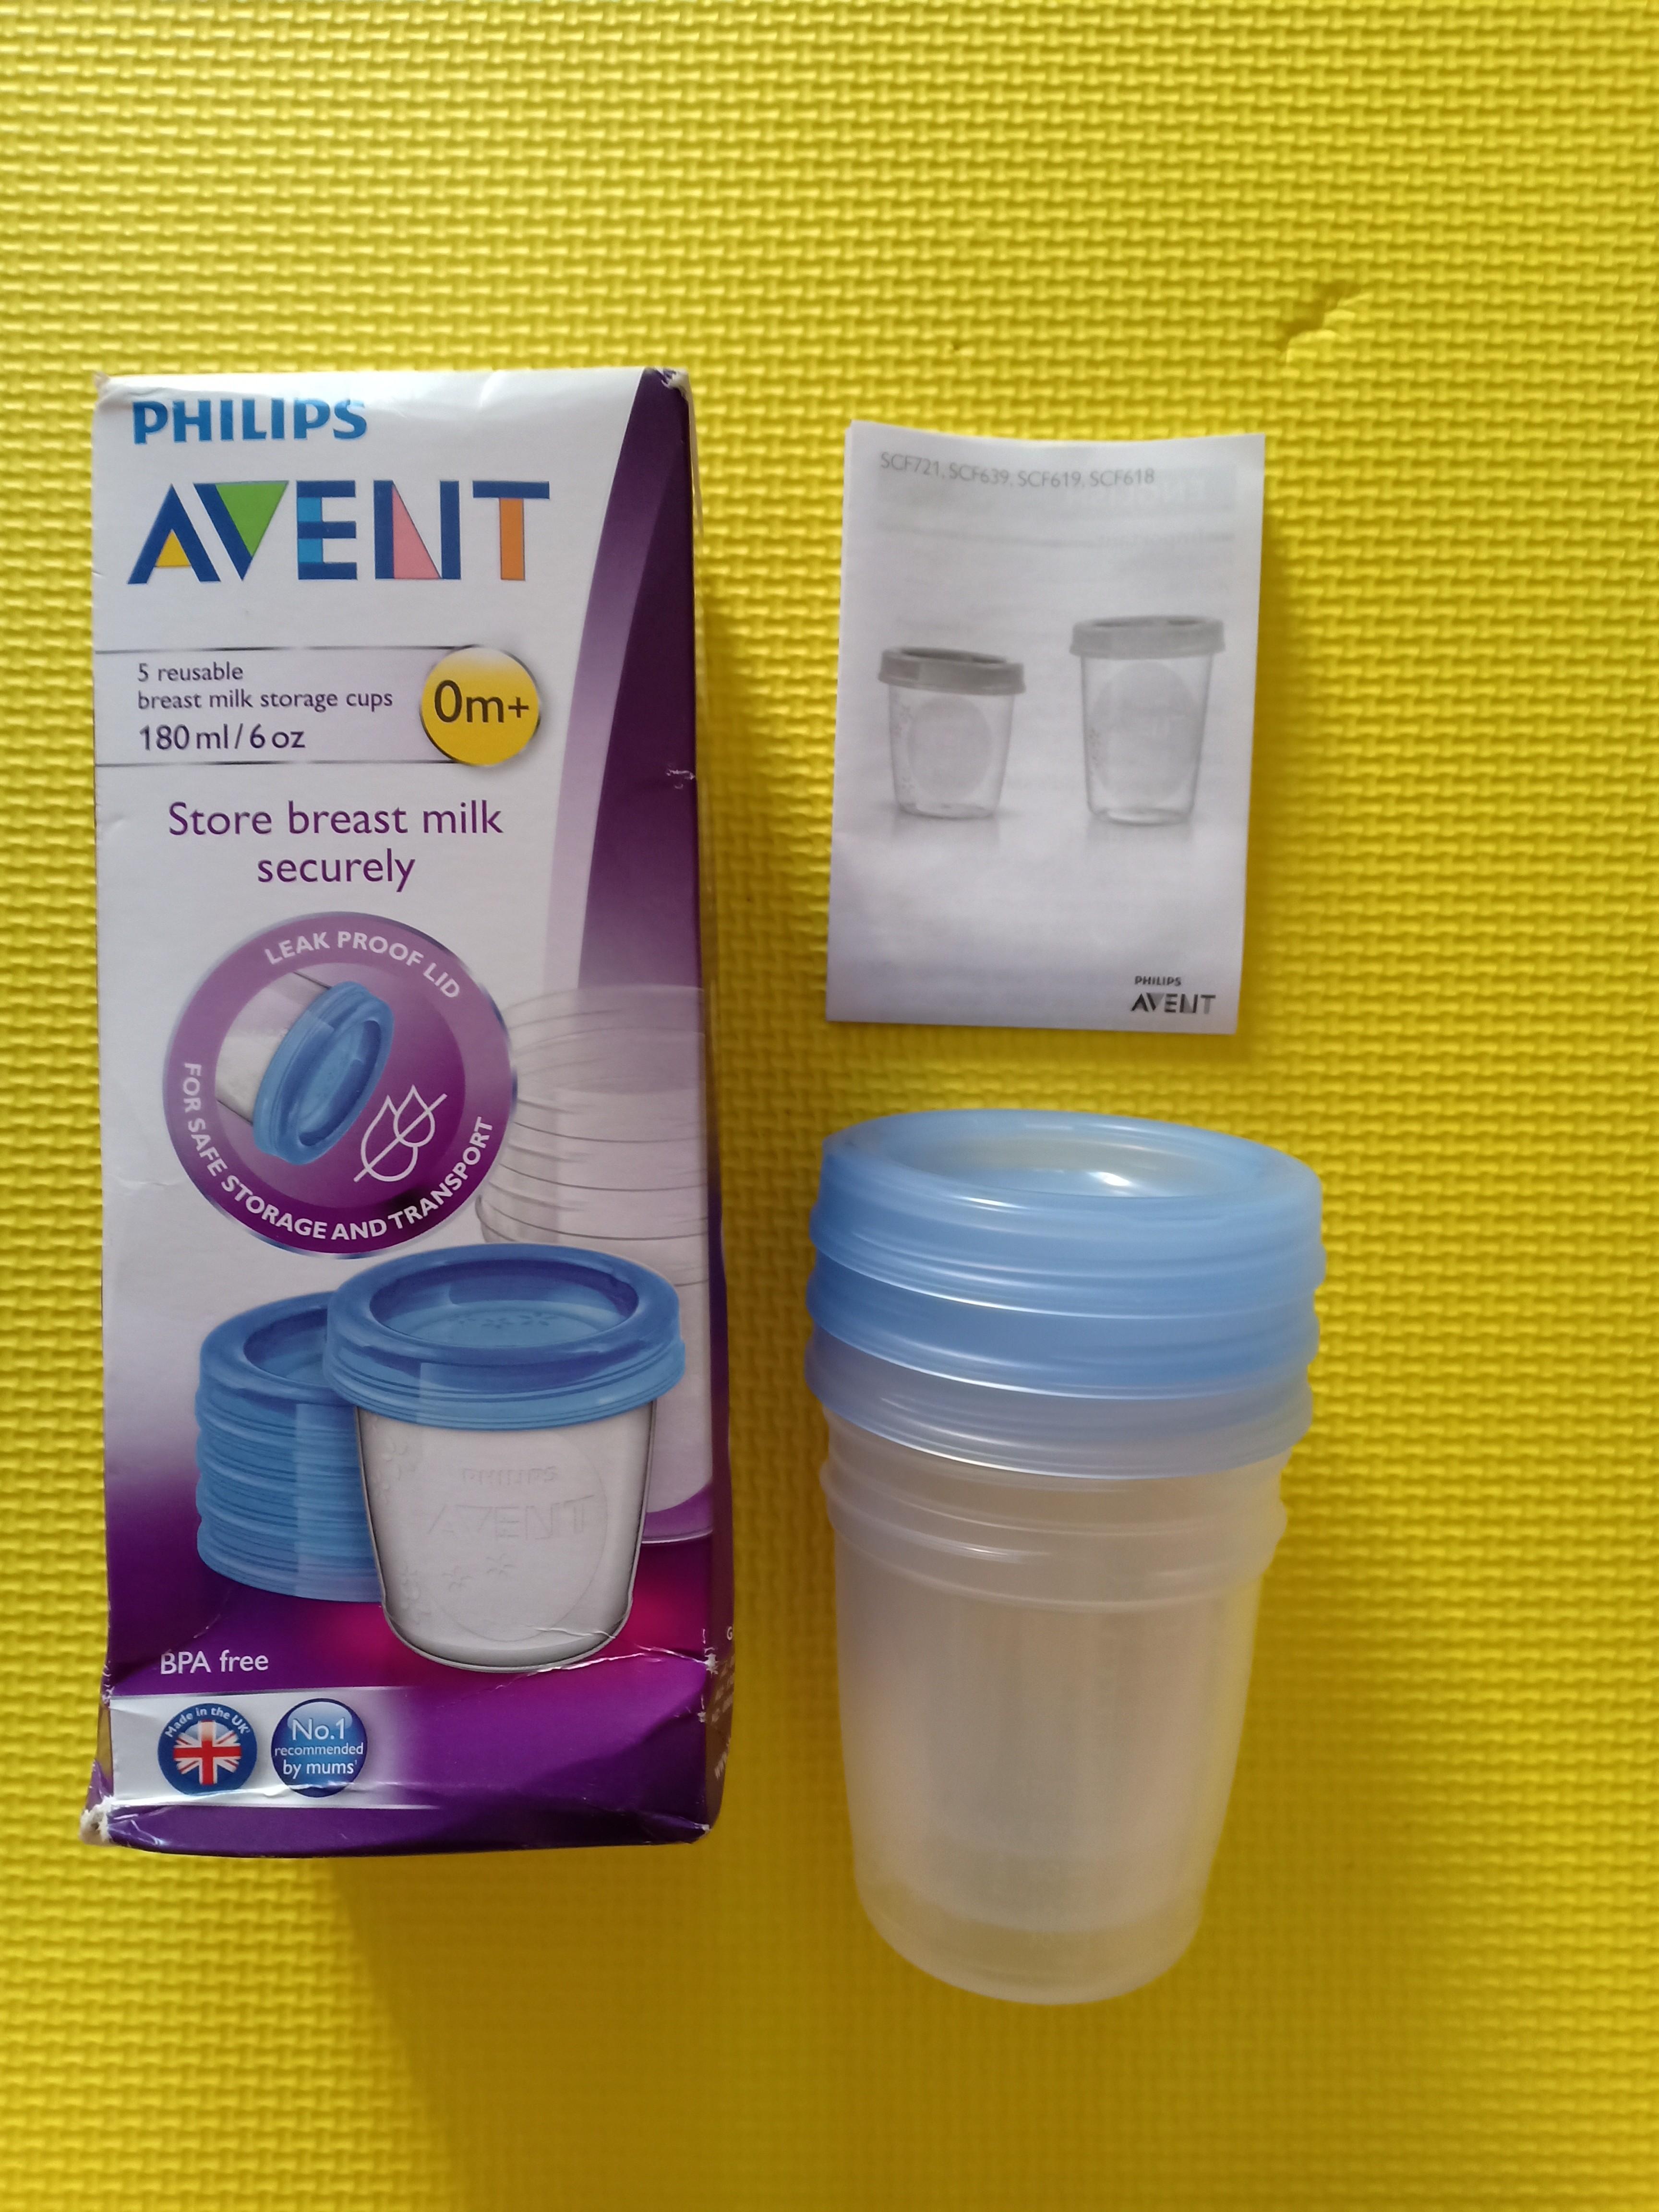 Avent breastmilk storage cups